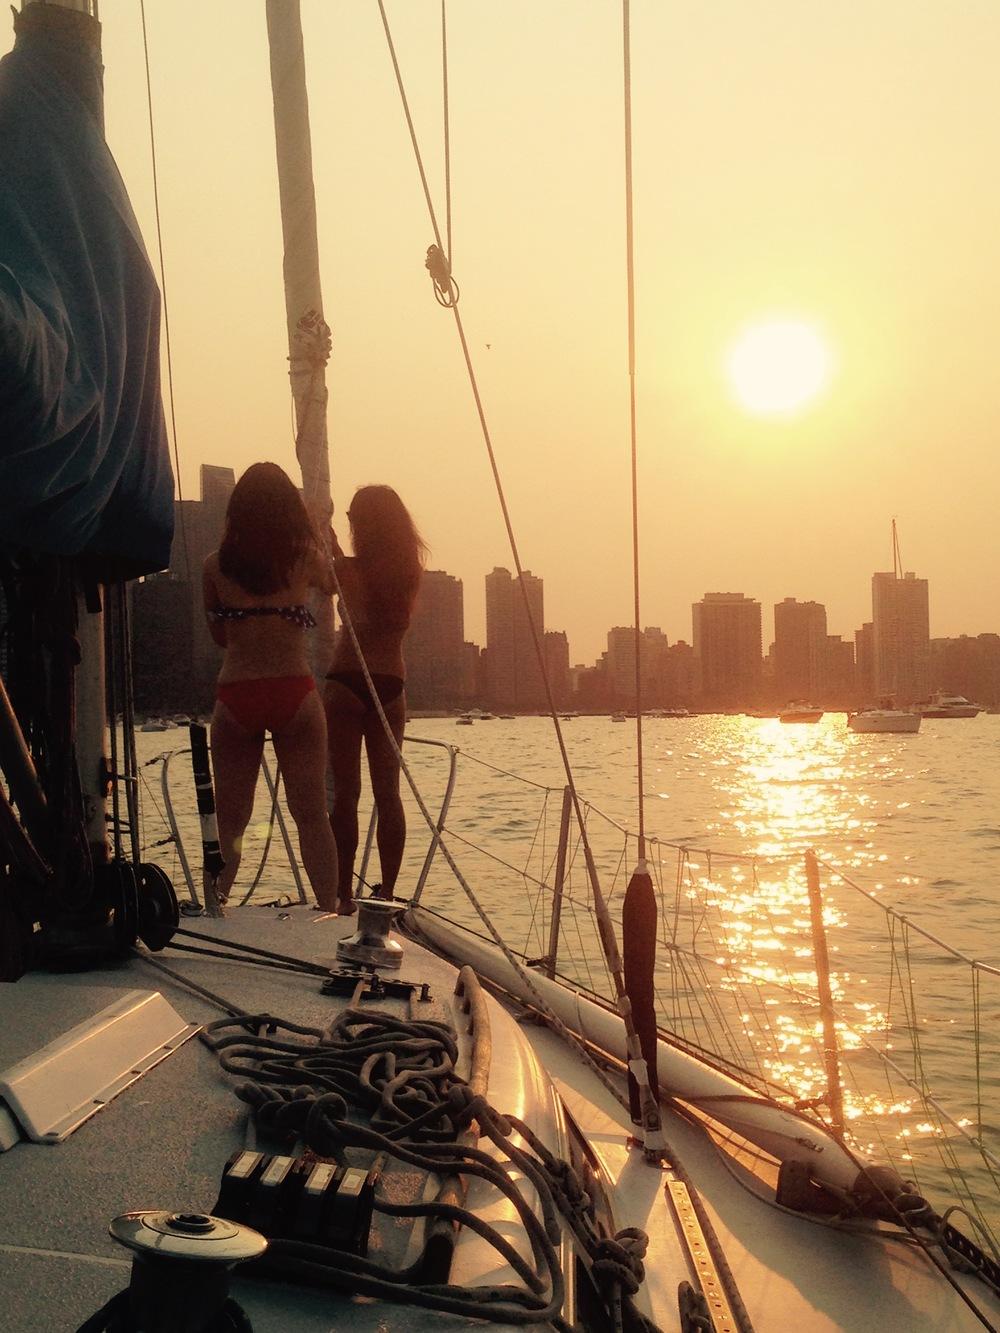 Salty Dog Sailing Chicago Charter Boat Tour July 4 2015_1.jpg